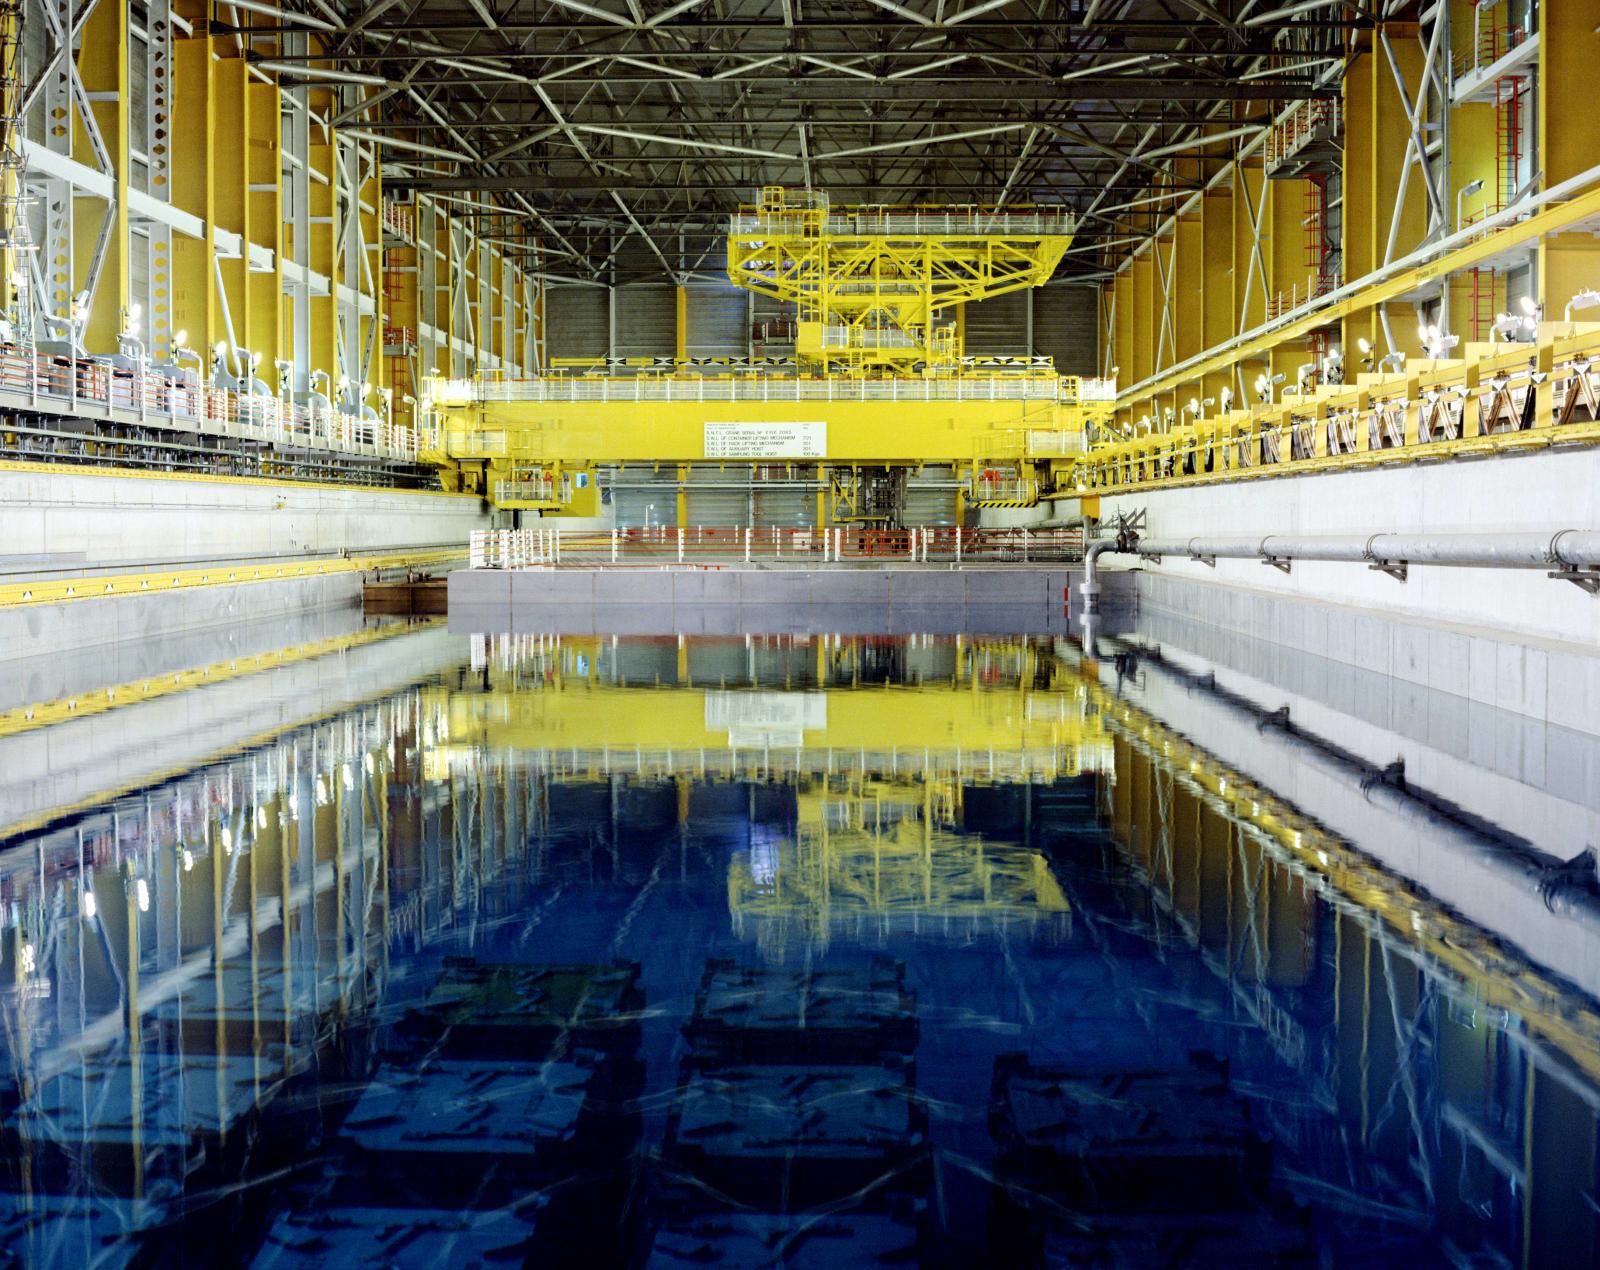 Nuclear storage pond